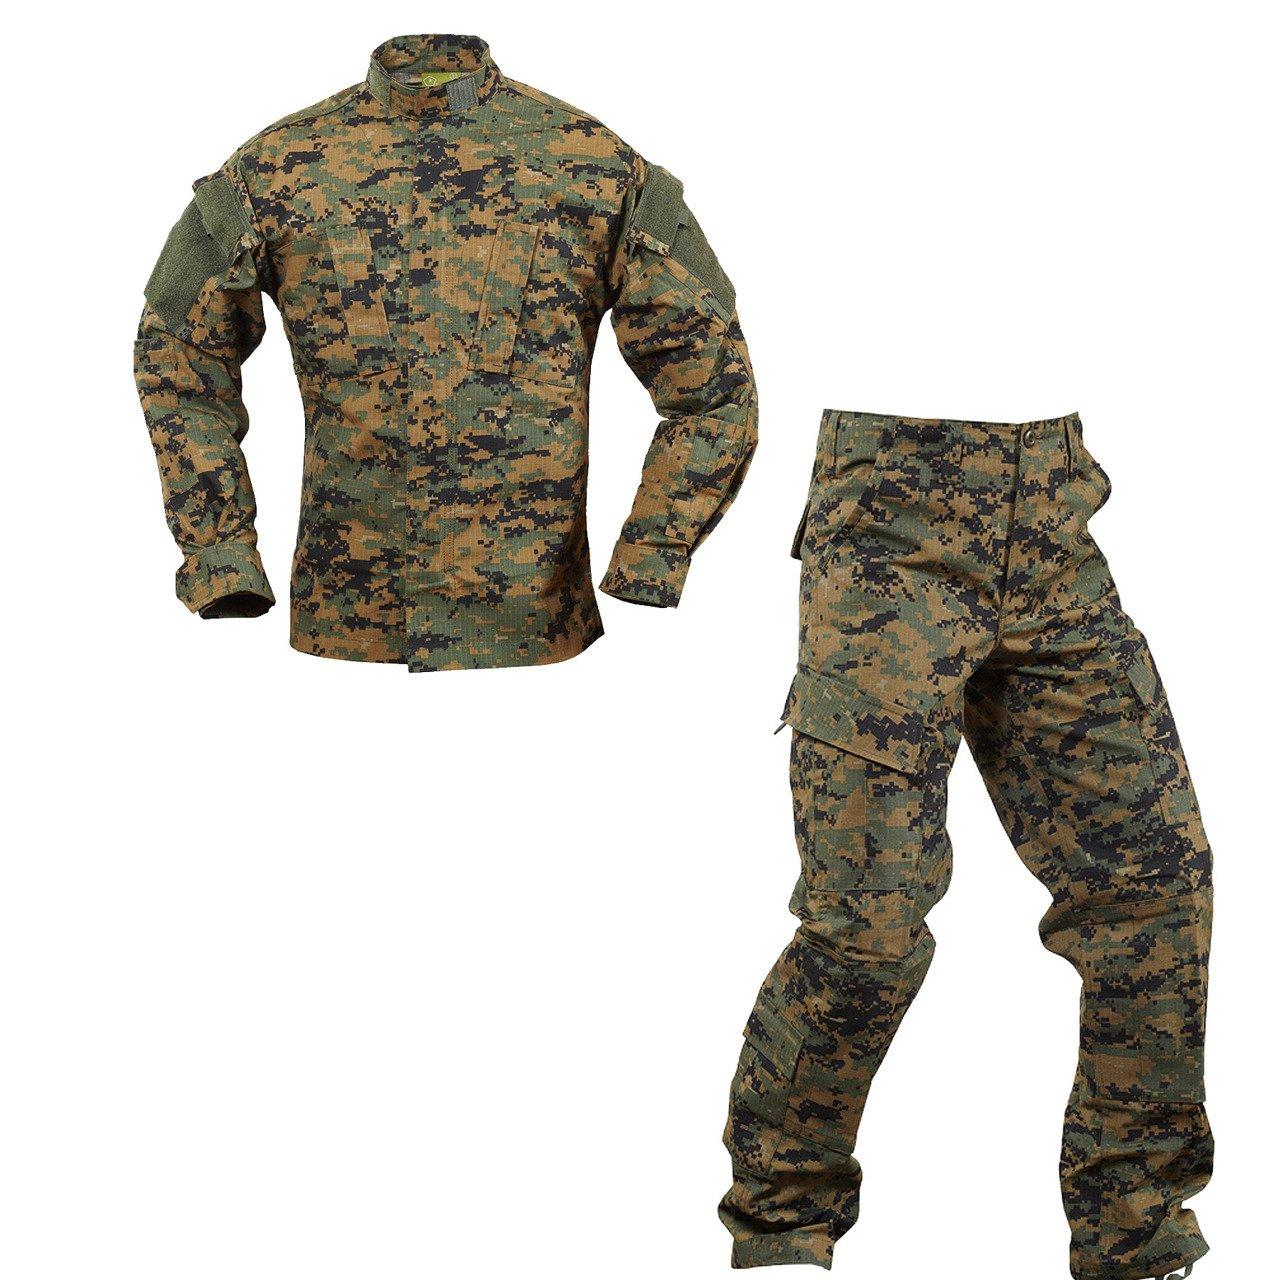 Tactical uniform ACU - Pentagon - Digital Woodland